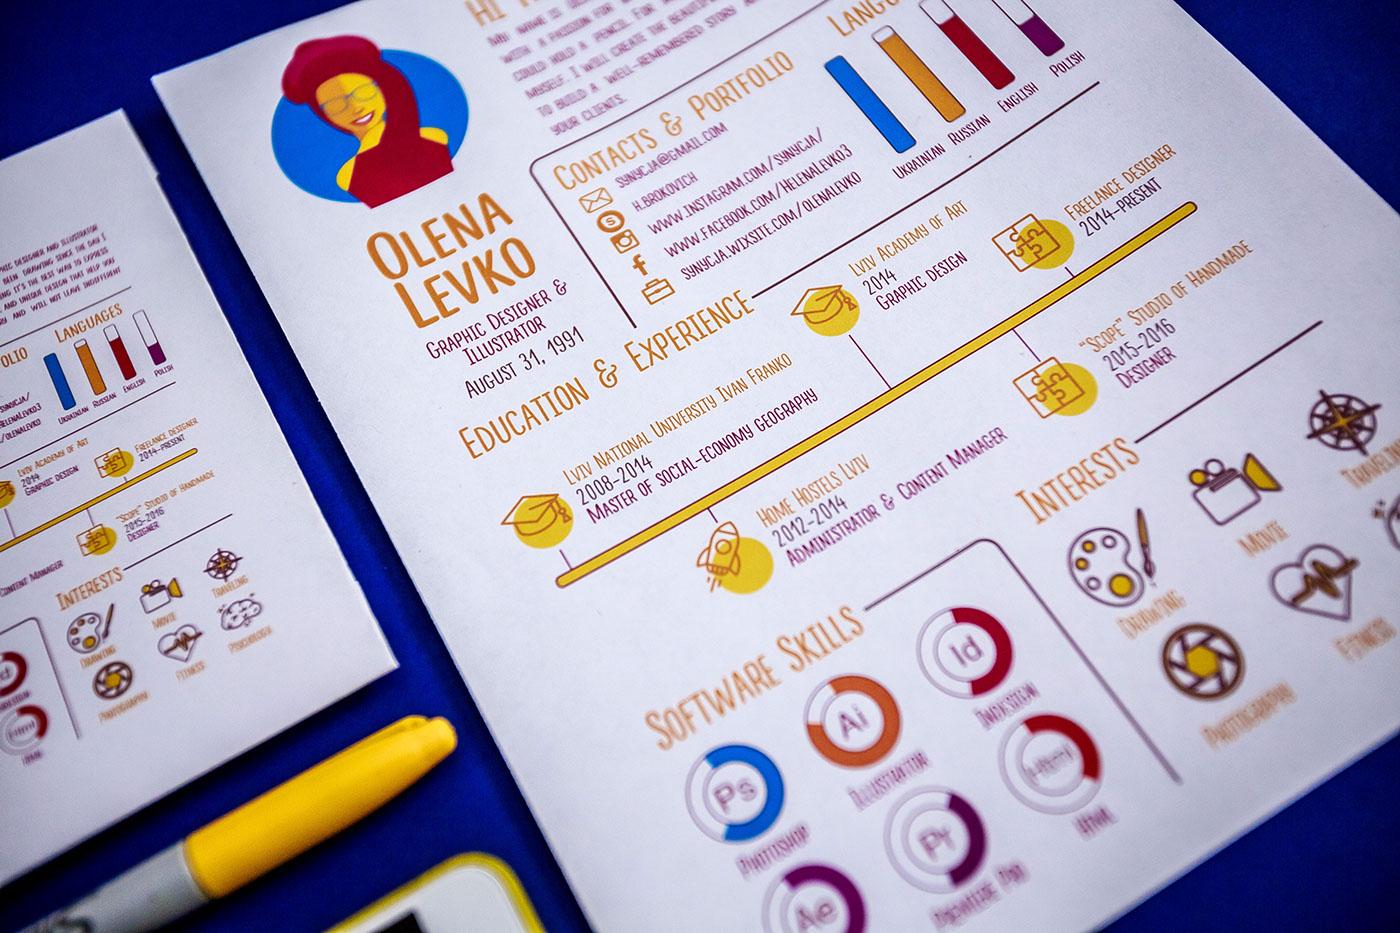 free,infographic,Resume,CV,template,Mockup,freebie,graphicdesign,designer